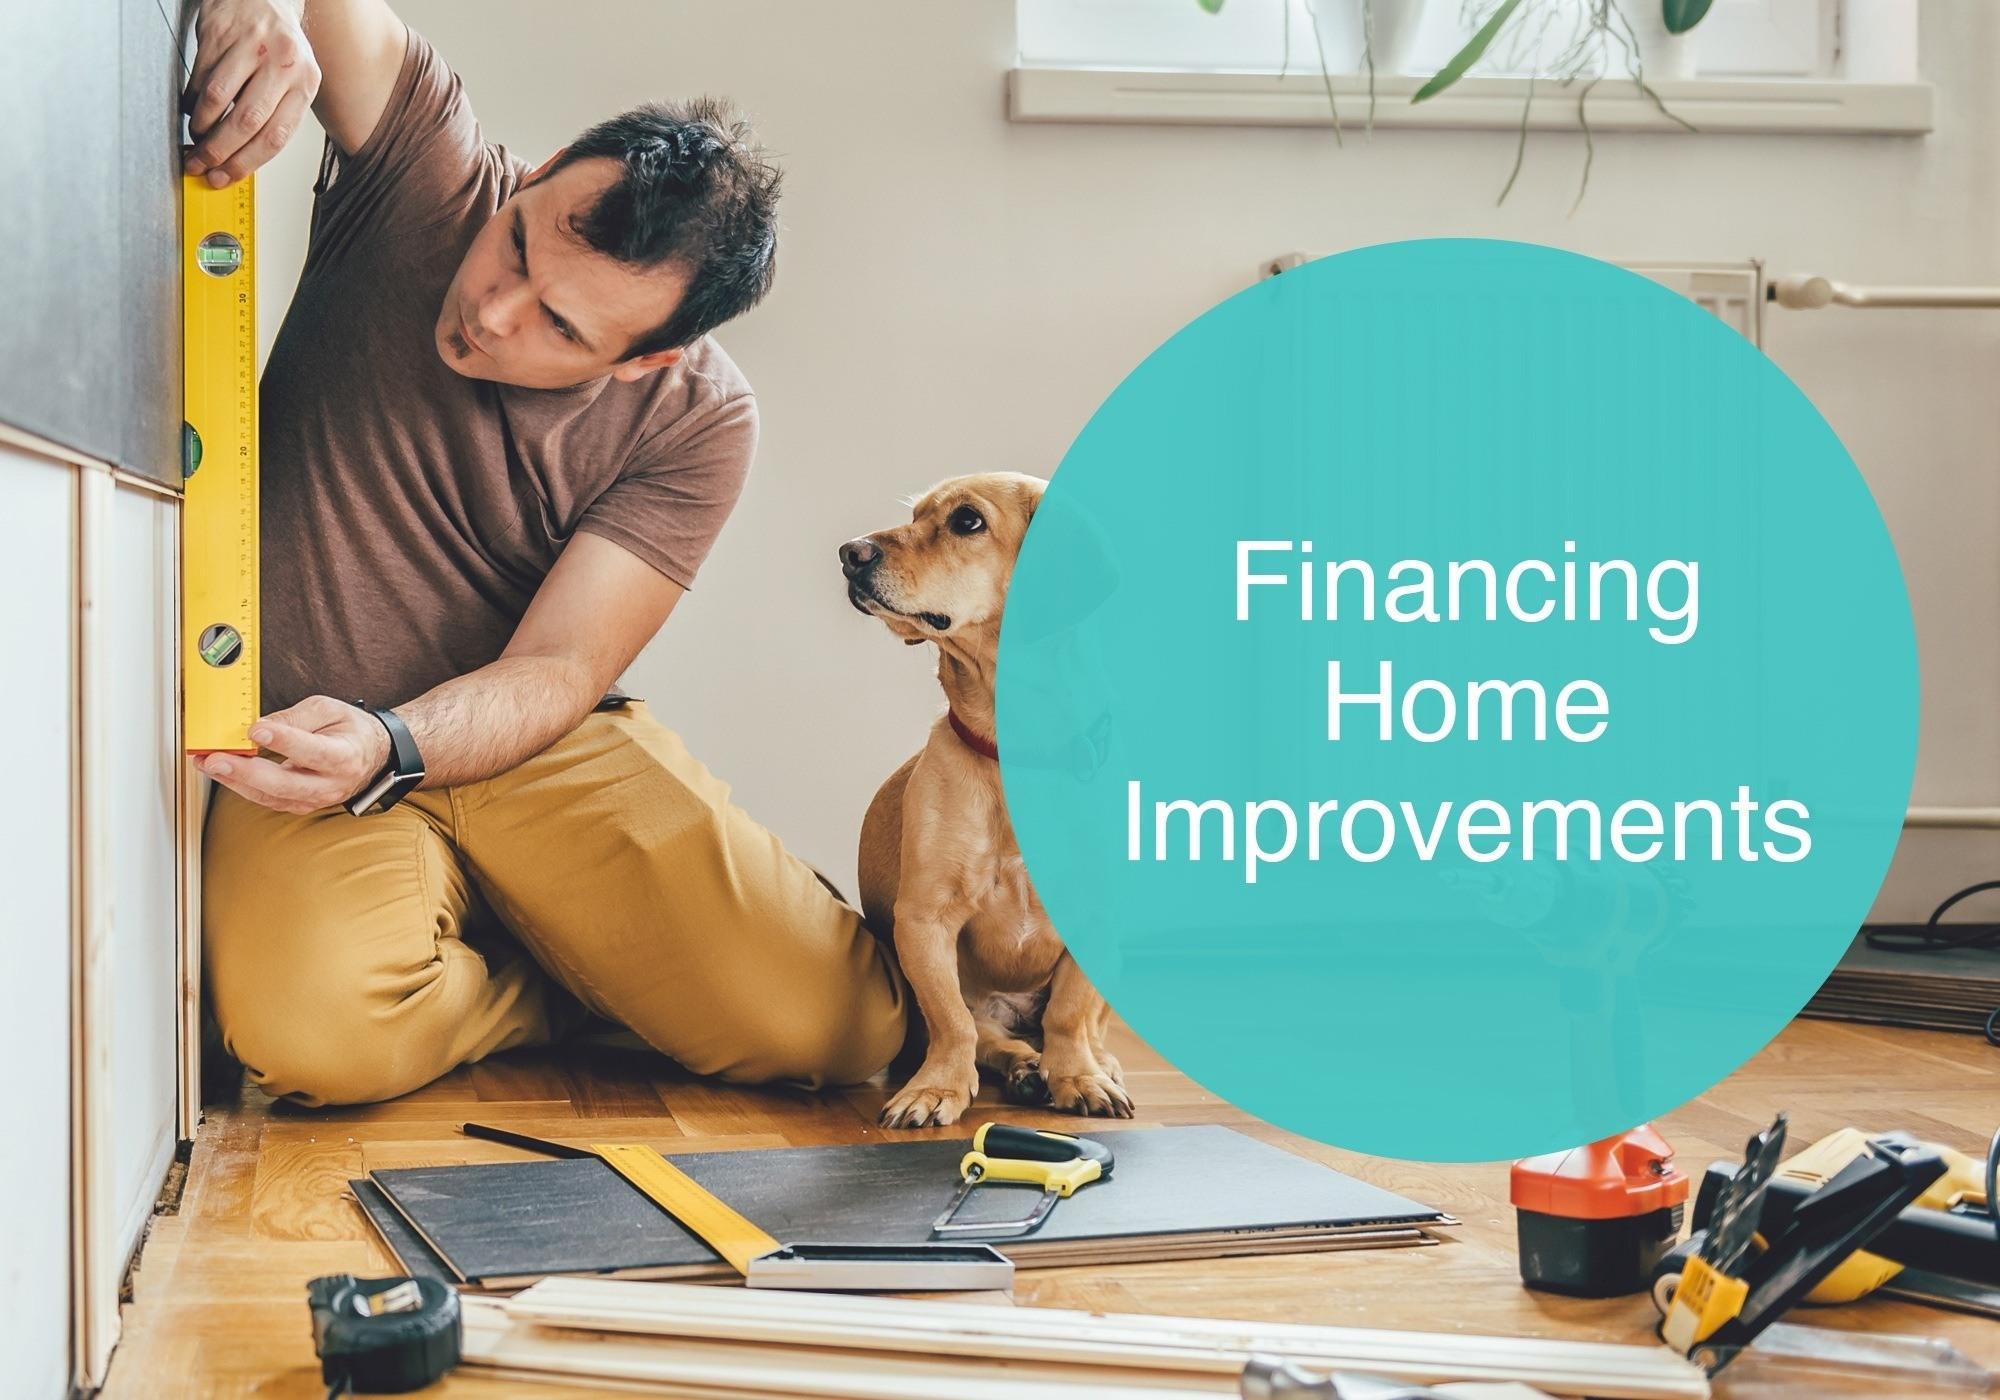 HELOC home improvements image